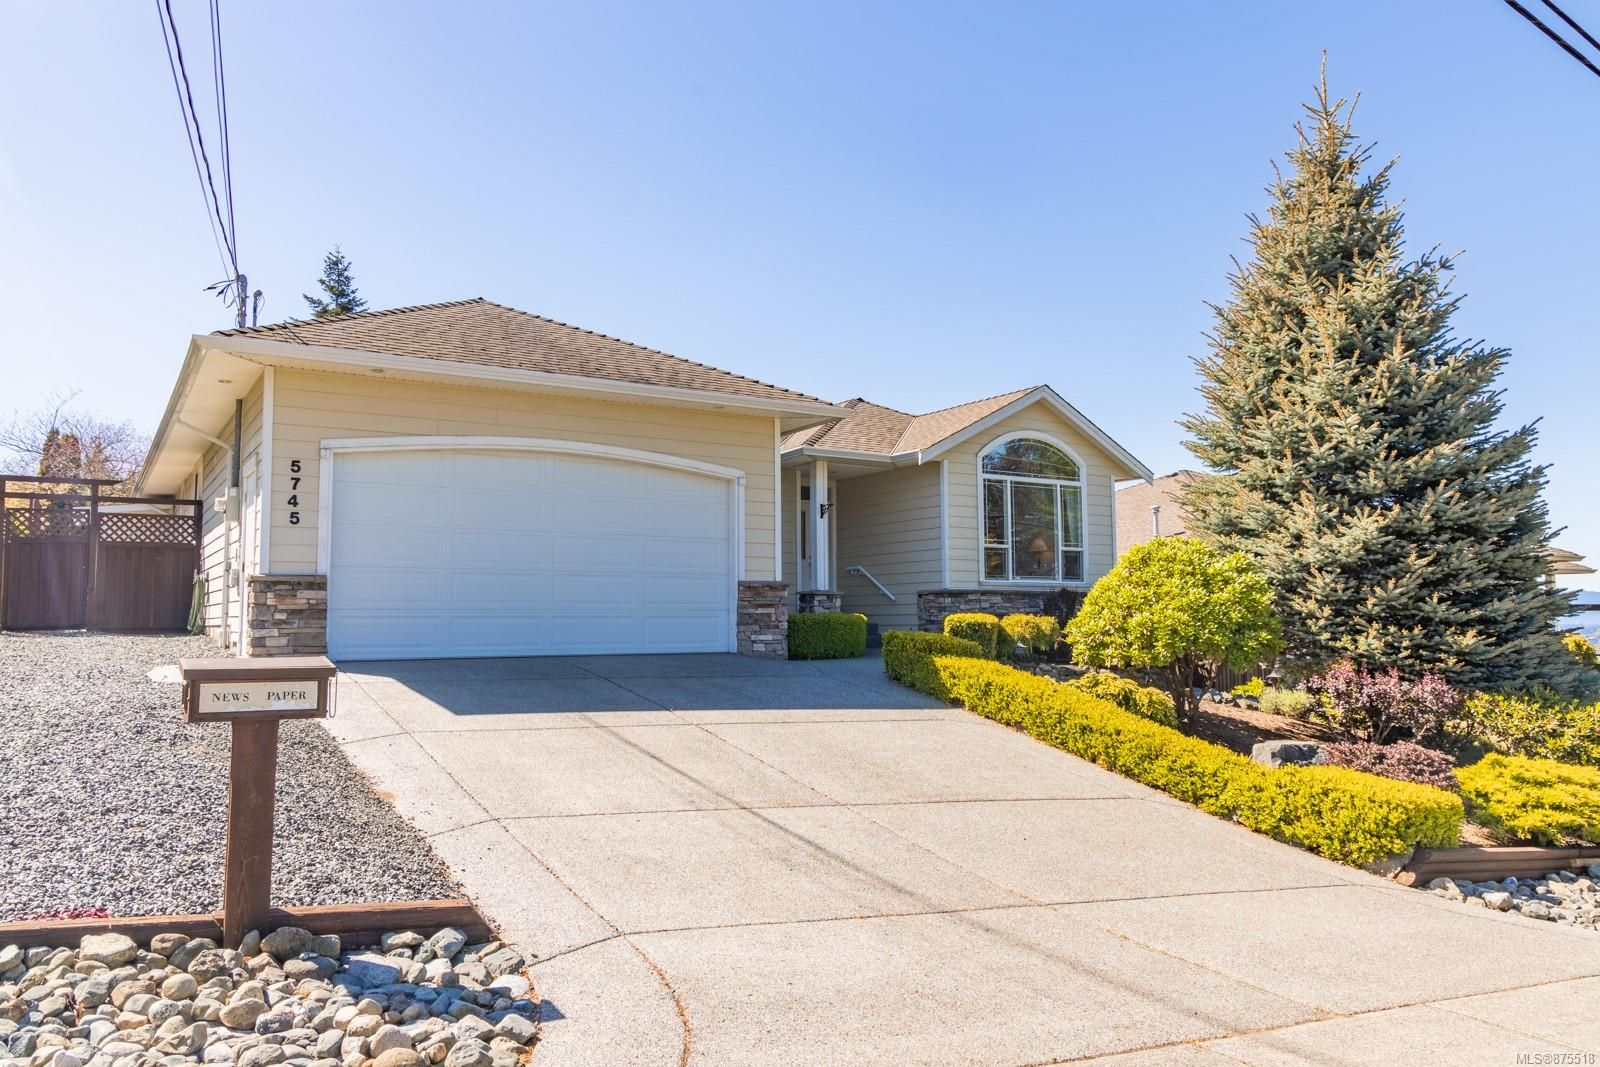 Main Photo: 5745 Norasea Rd in : Na North Nanaimo House for sale (Nanaimo)  : MLS®# 875518